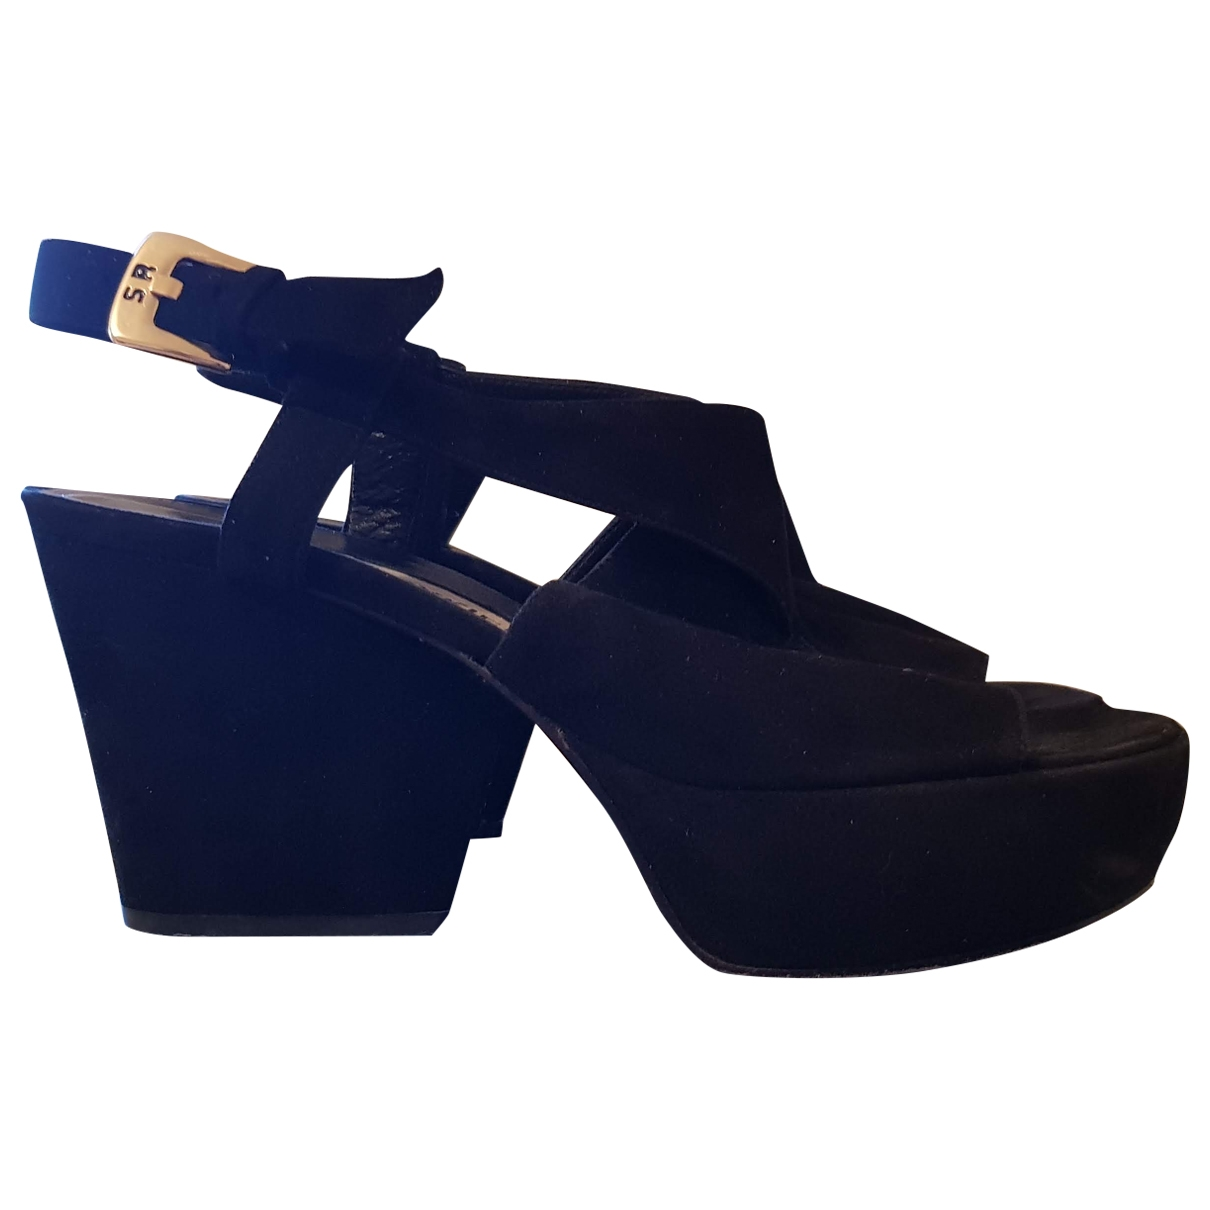 Sonia Rykiel \N Black Suede Sandals for Women 36 EU